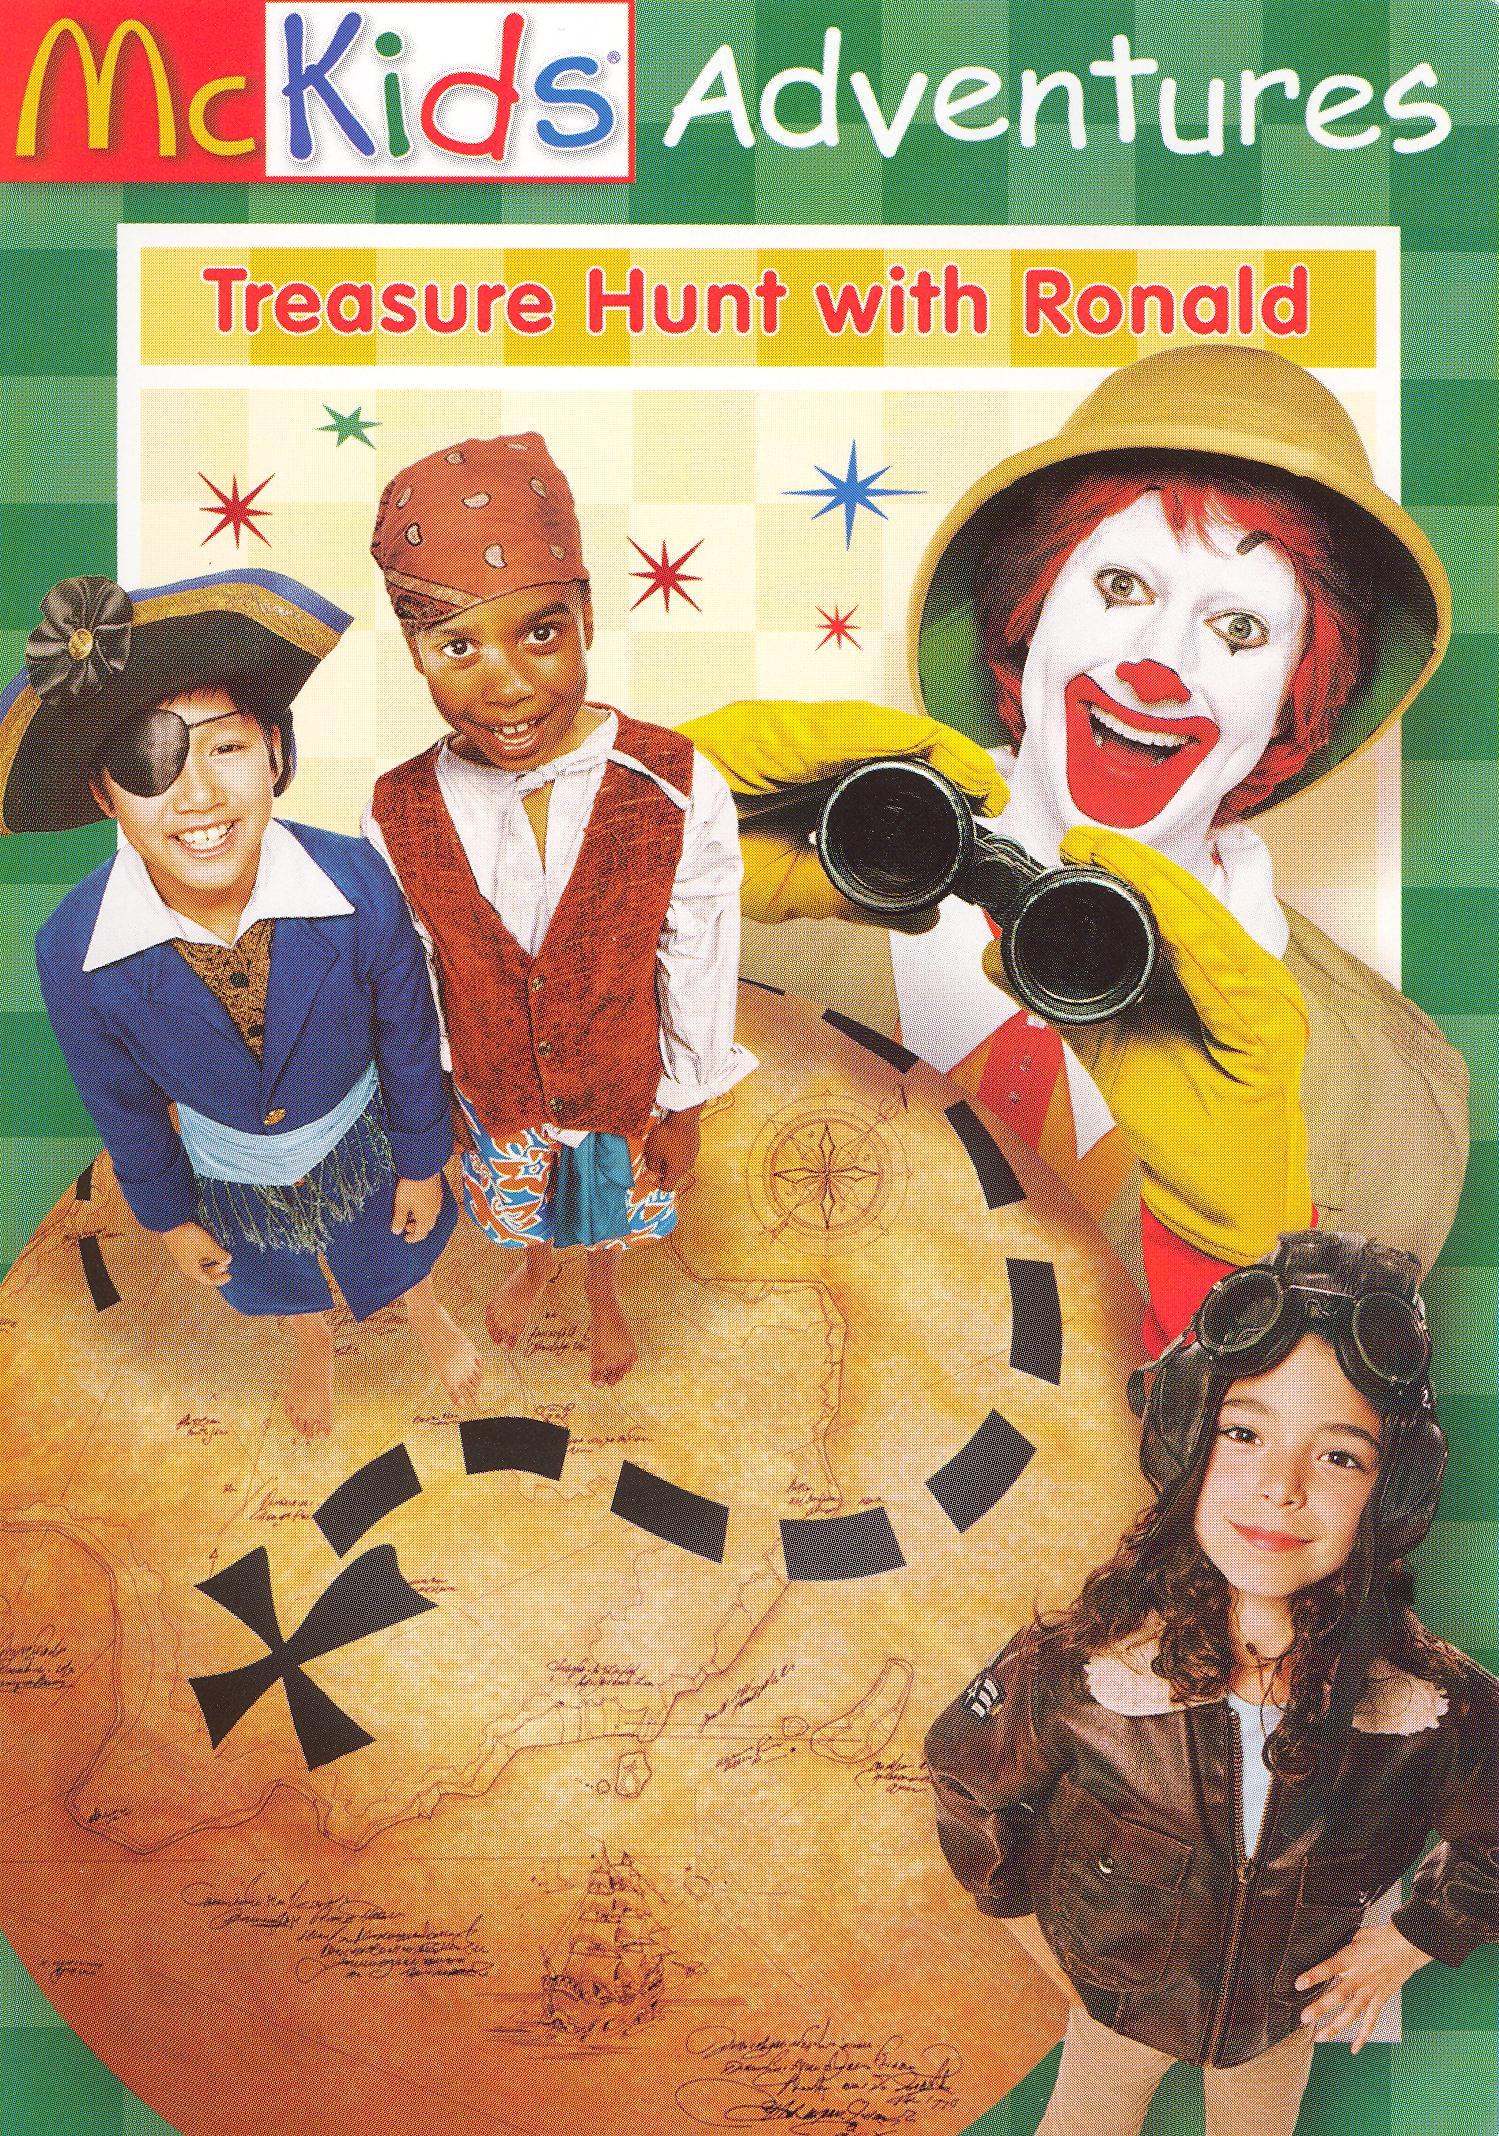 McKids Adventure: Treasure Hunt with Ronald